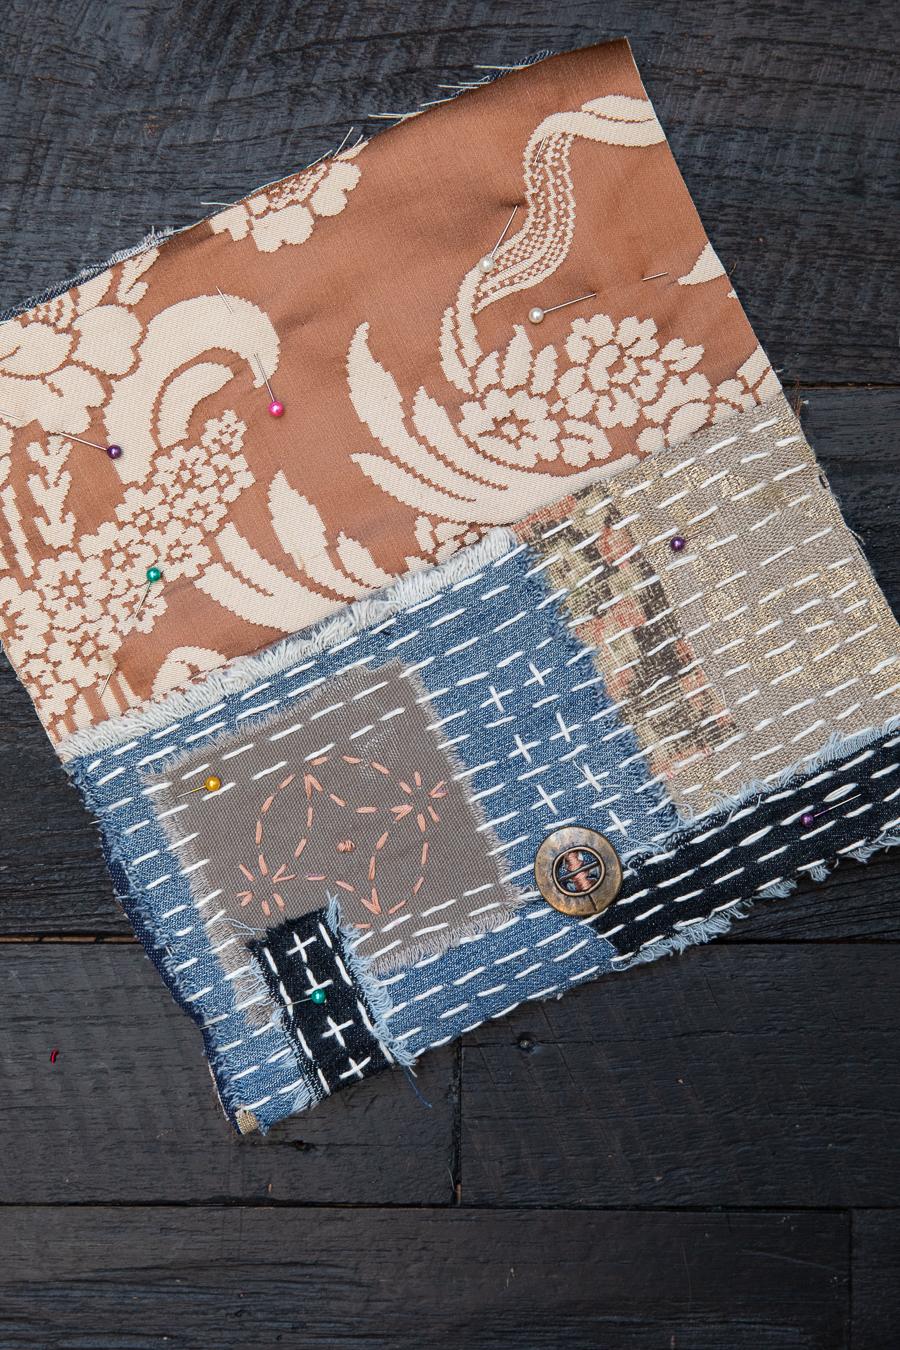 make-art-life-blog-boro-clutch-kit-16